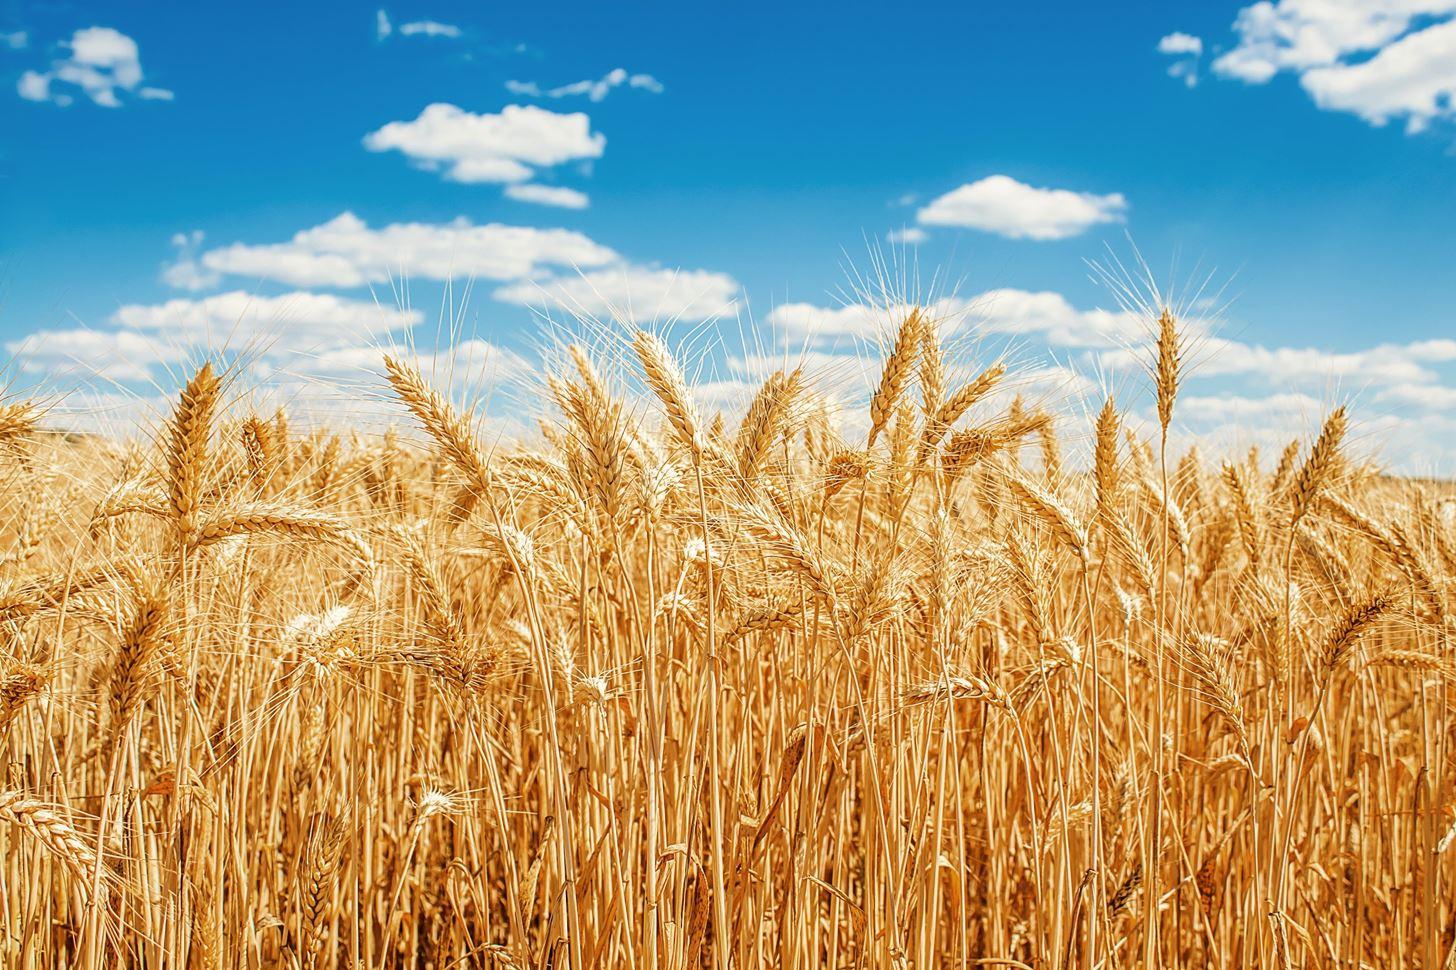 nix grain brain anti gluten train its good eat whole grains w1456 2